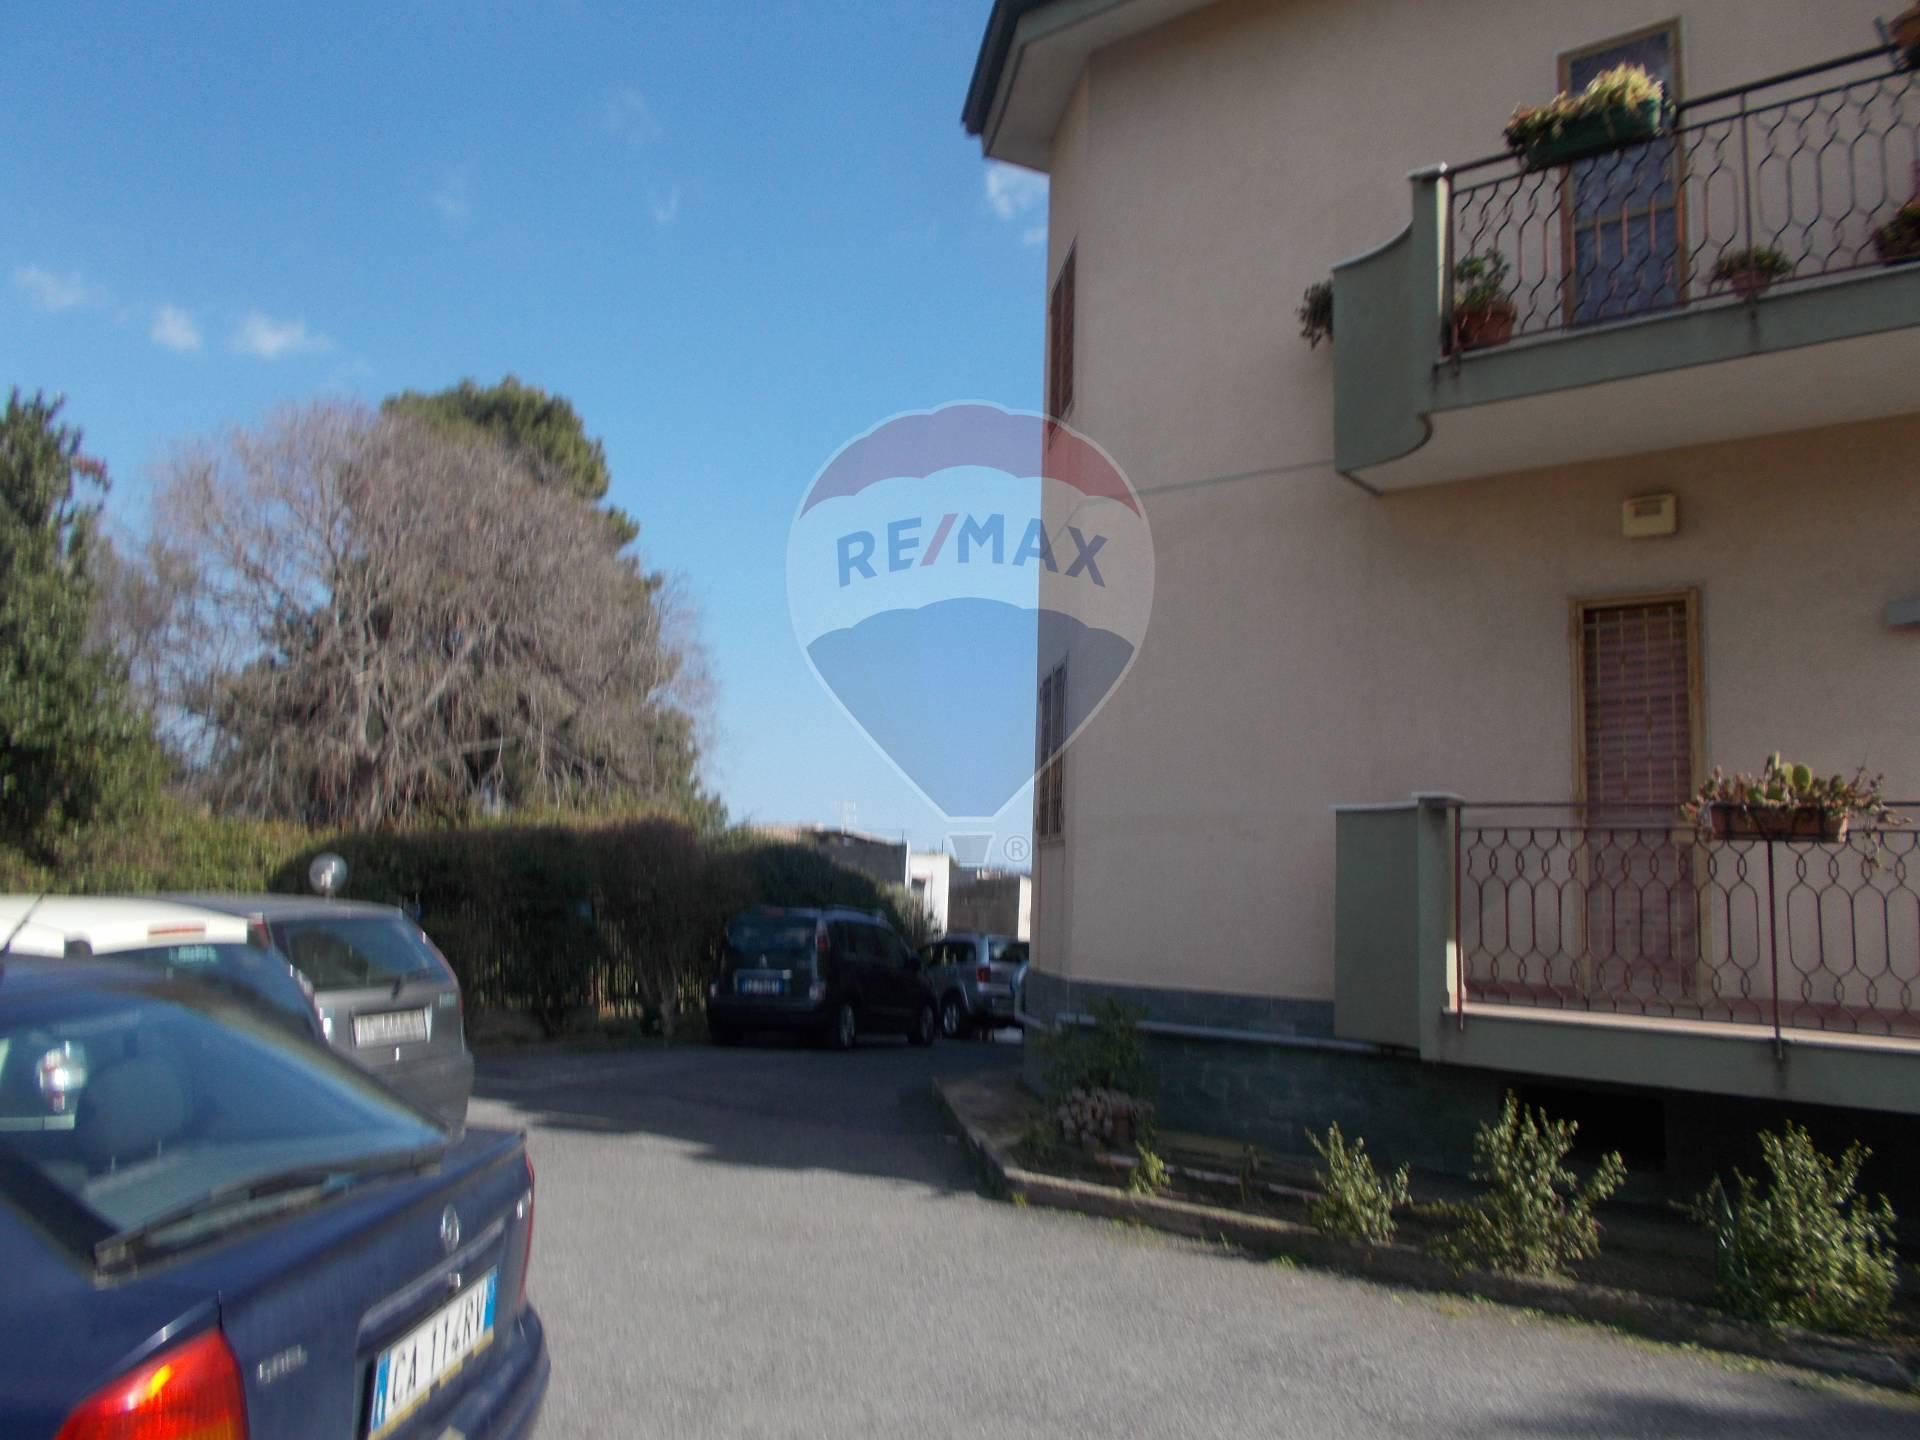 Appartamento CATANIA vendita  Catania-rapisardi-diaz,san Nullo,sebastiano Catani  RE/MAX Casa Trend